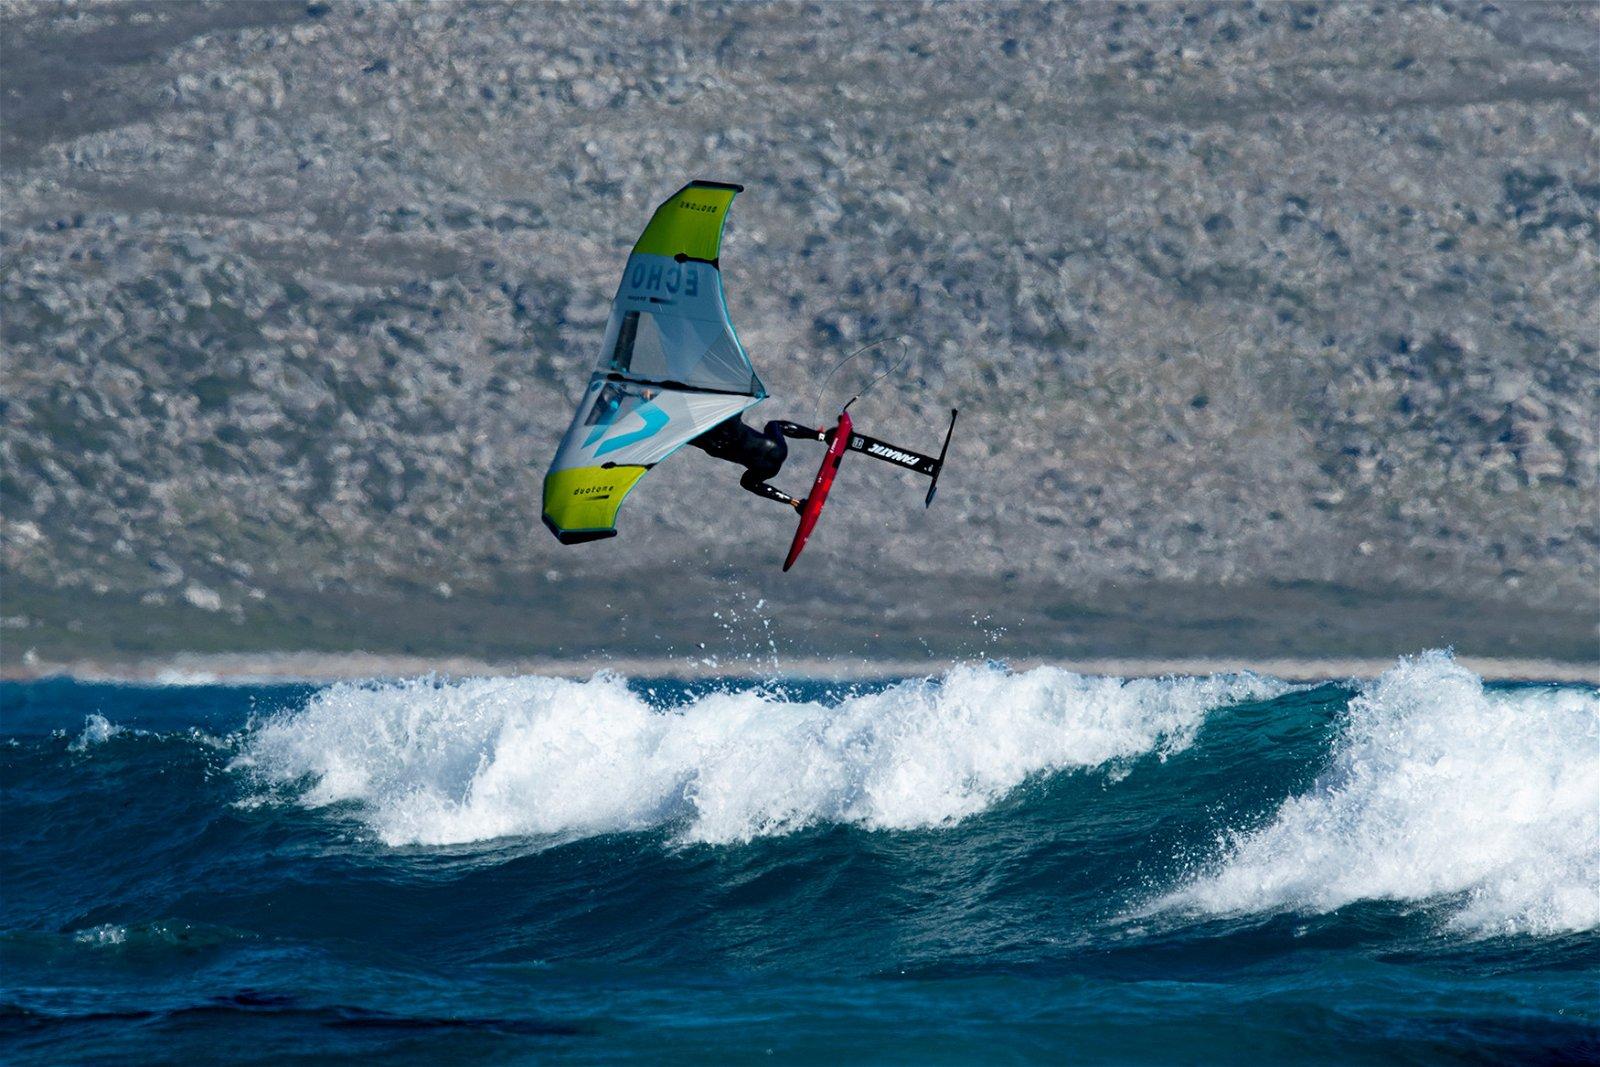 Klaas Wing CapeTown byCraigKoleskyCK 200224 Duotone 0818